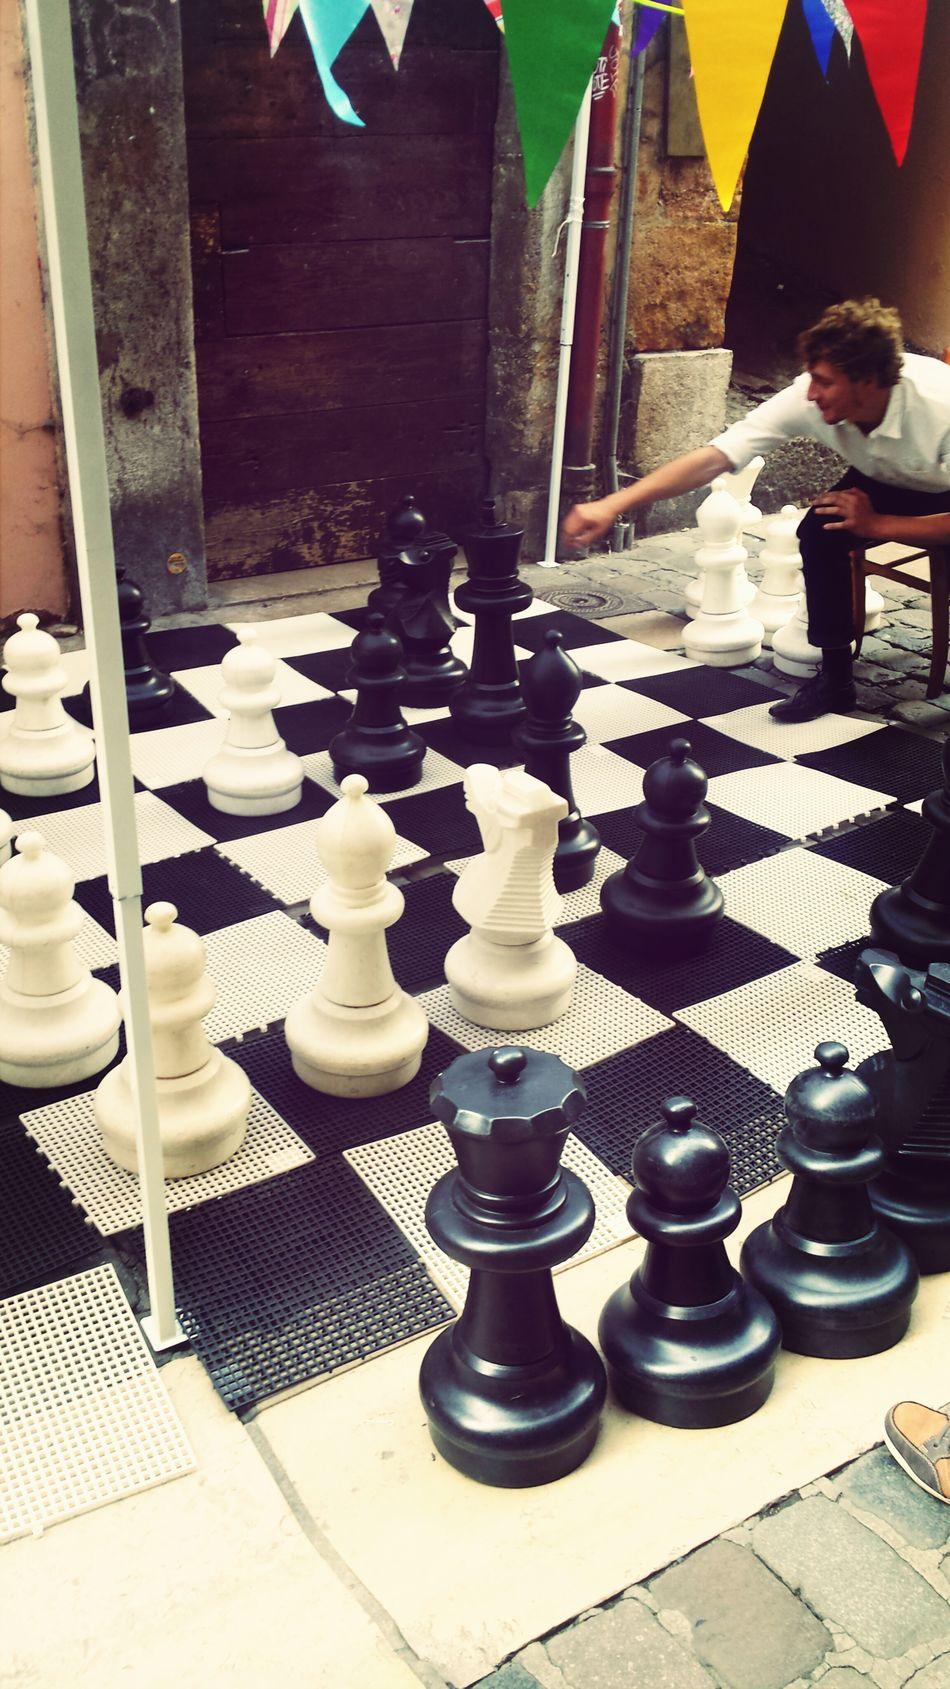 Giant Chess Vieux Lyon